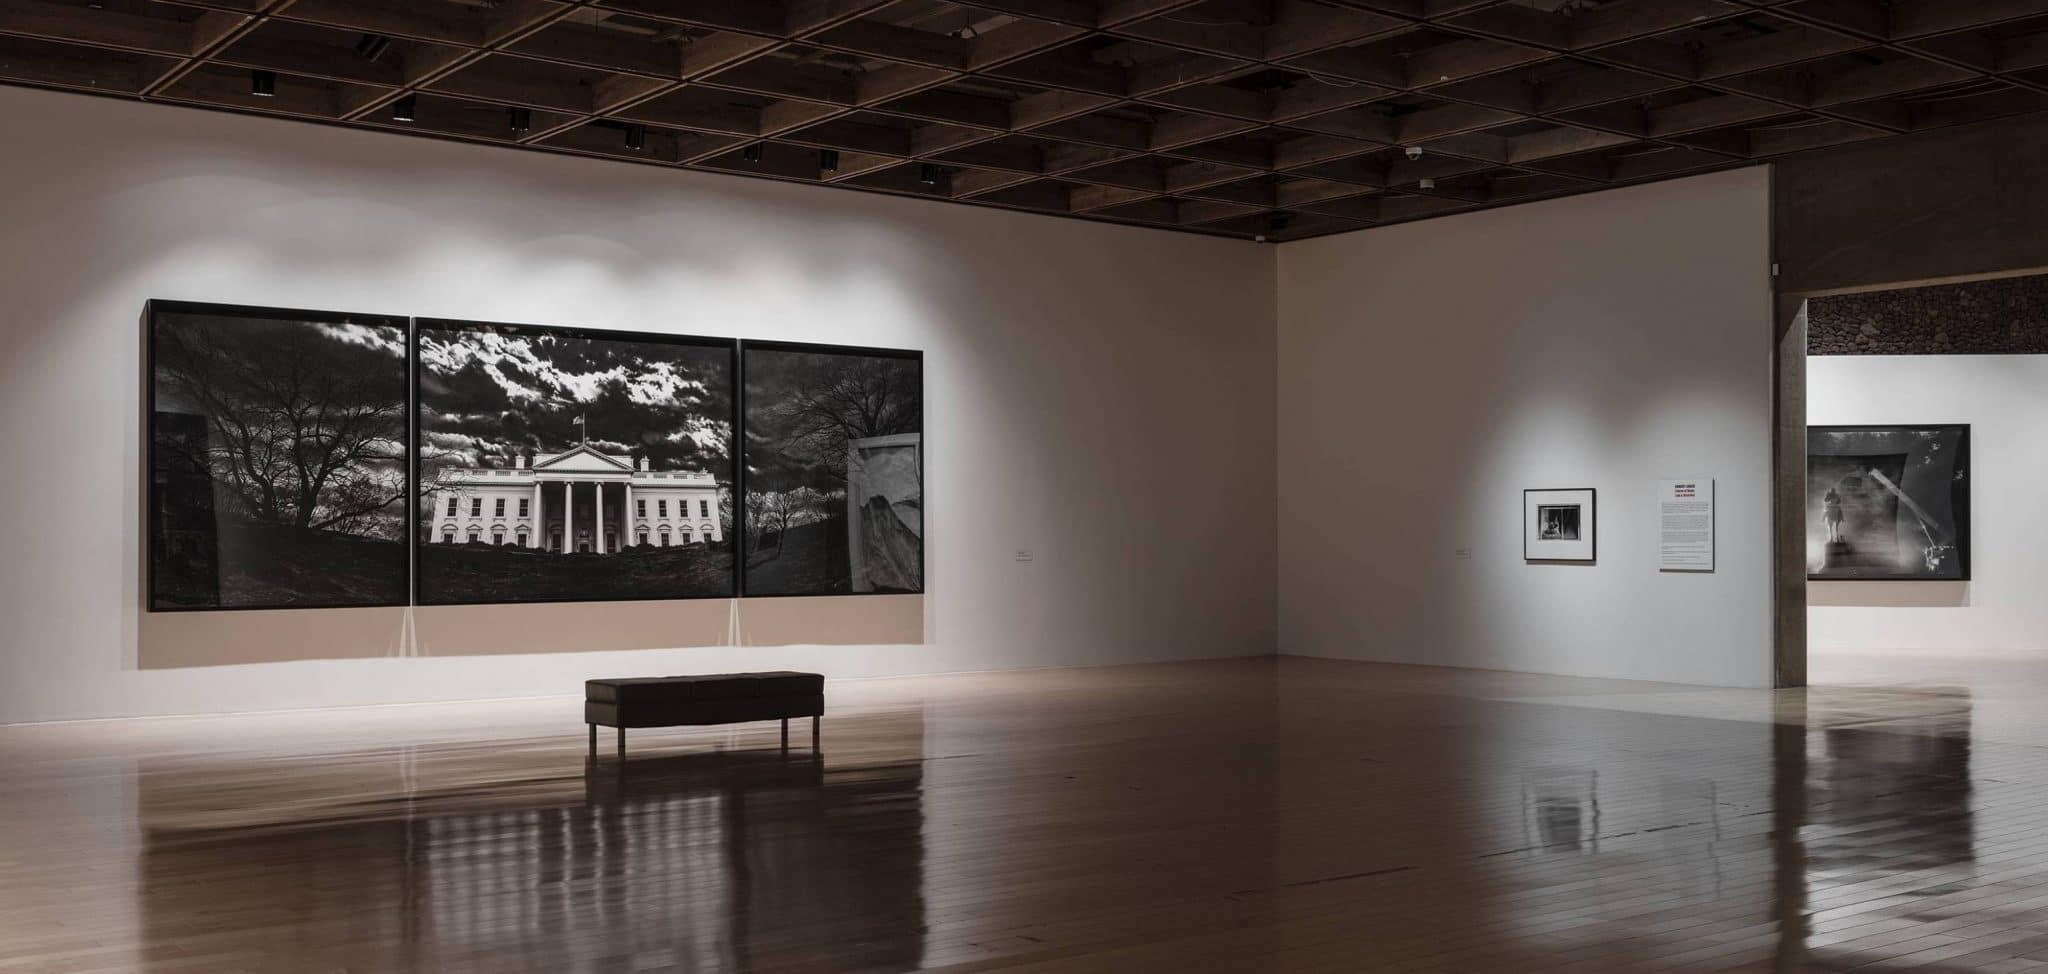 Robert Longo Storm of Hope: Law & Disorder Palm Springs Art Museum